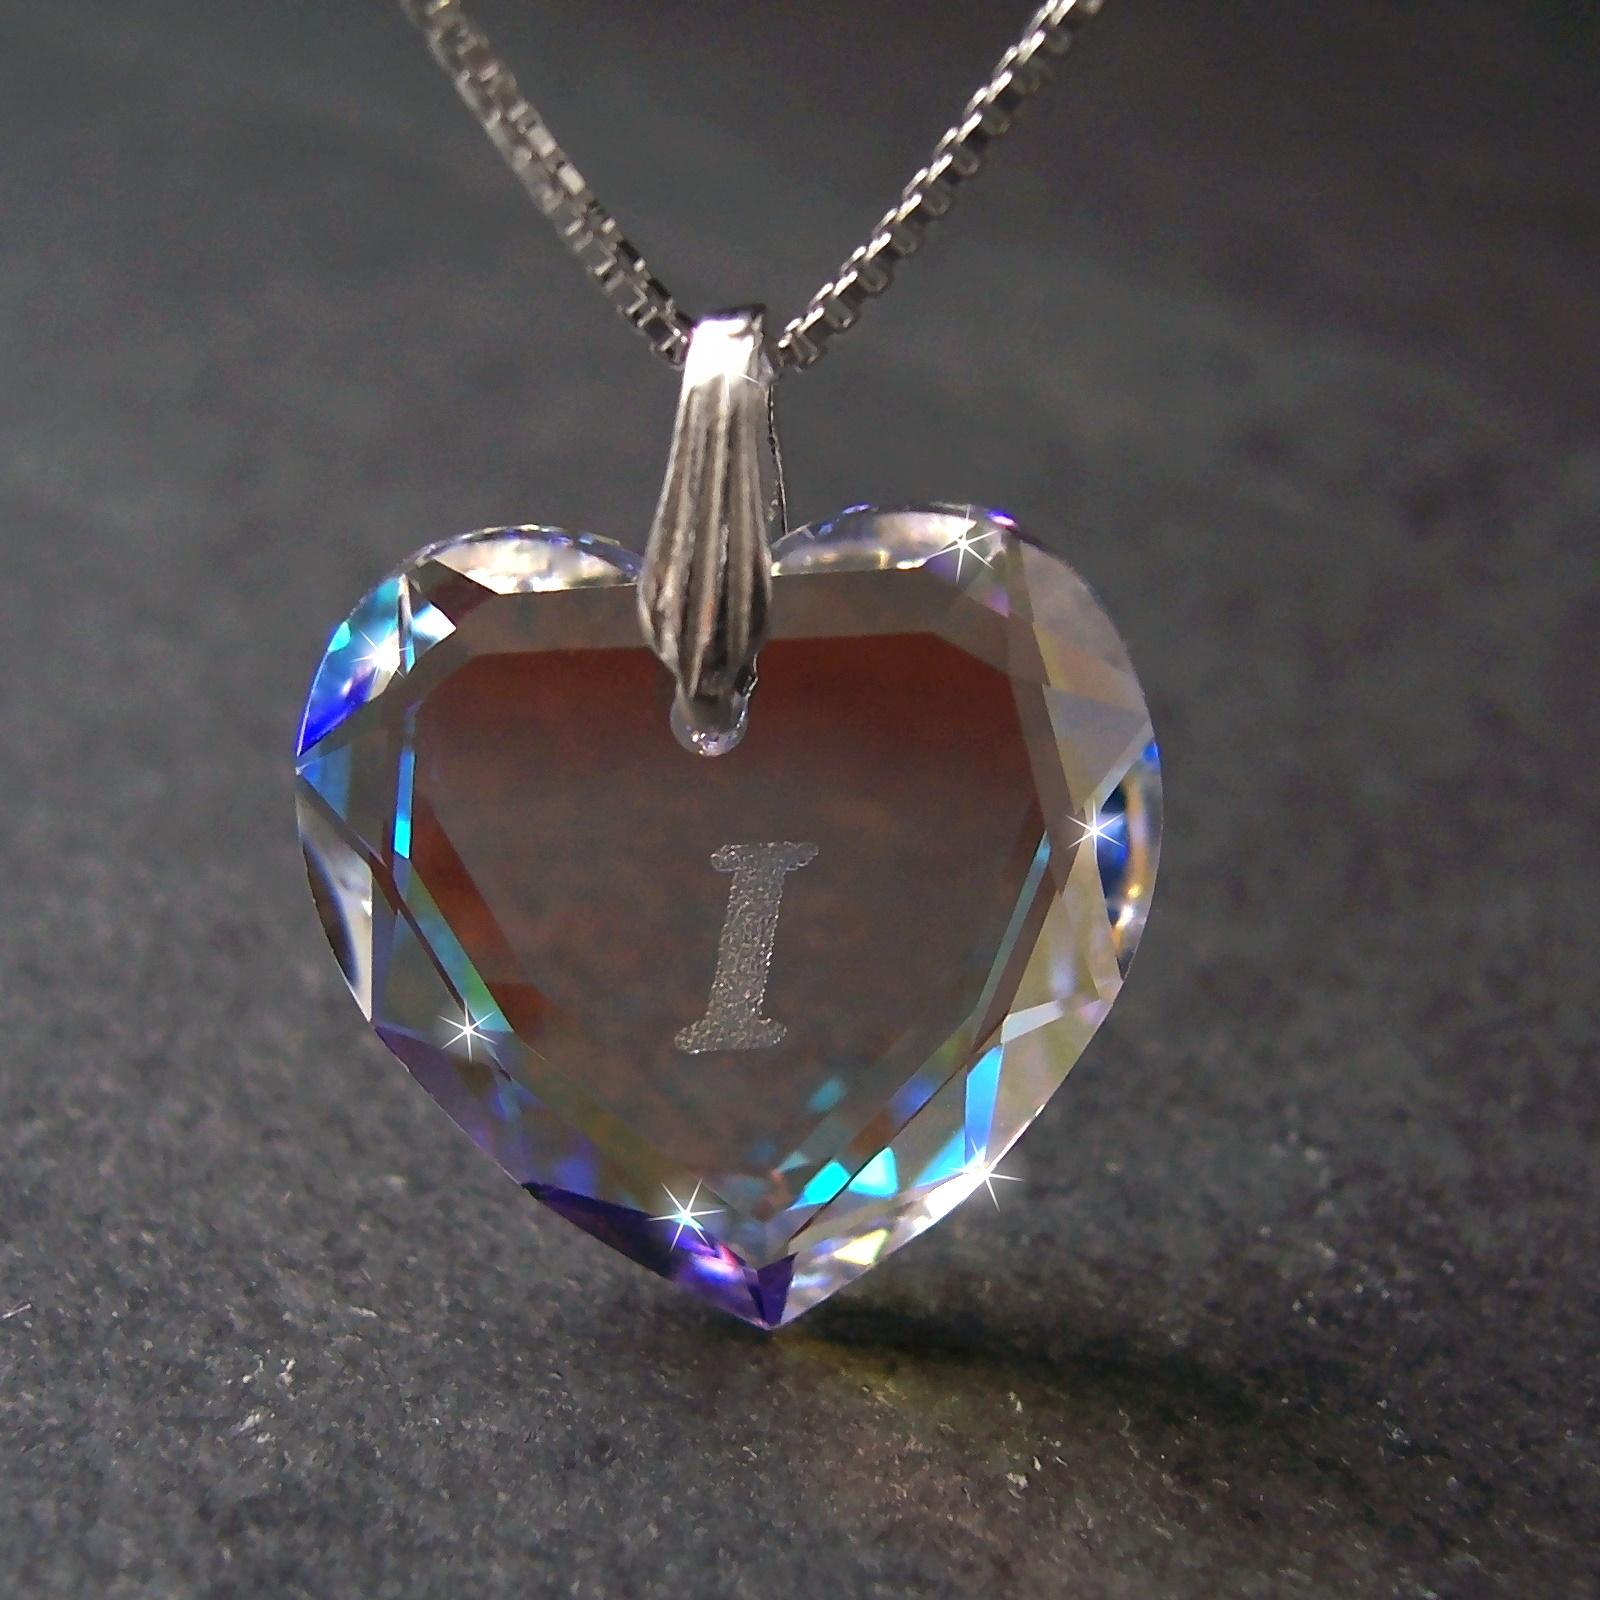 Kette 925 Silber Venezia 45cm Herz Swarovski Kristall BlueAB 1631245-i